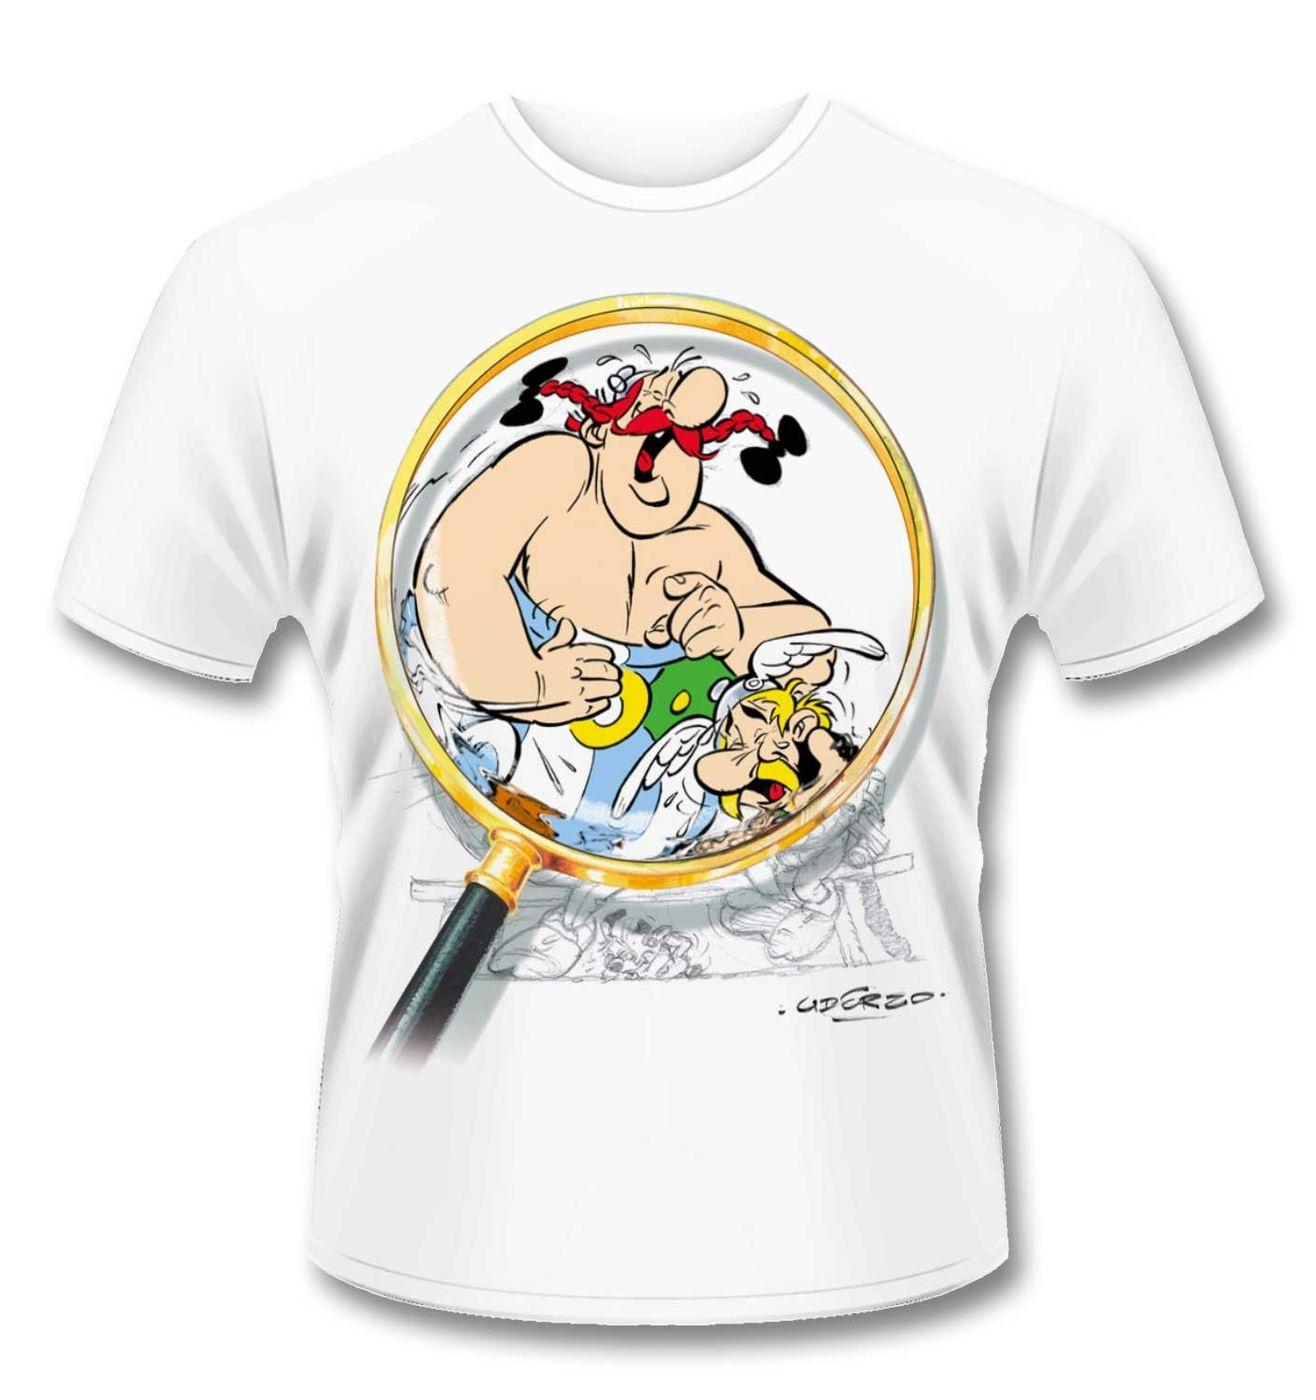 Official Asterix Magnifier t-shirt